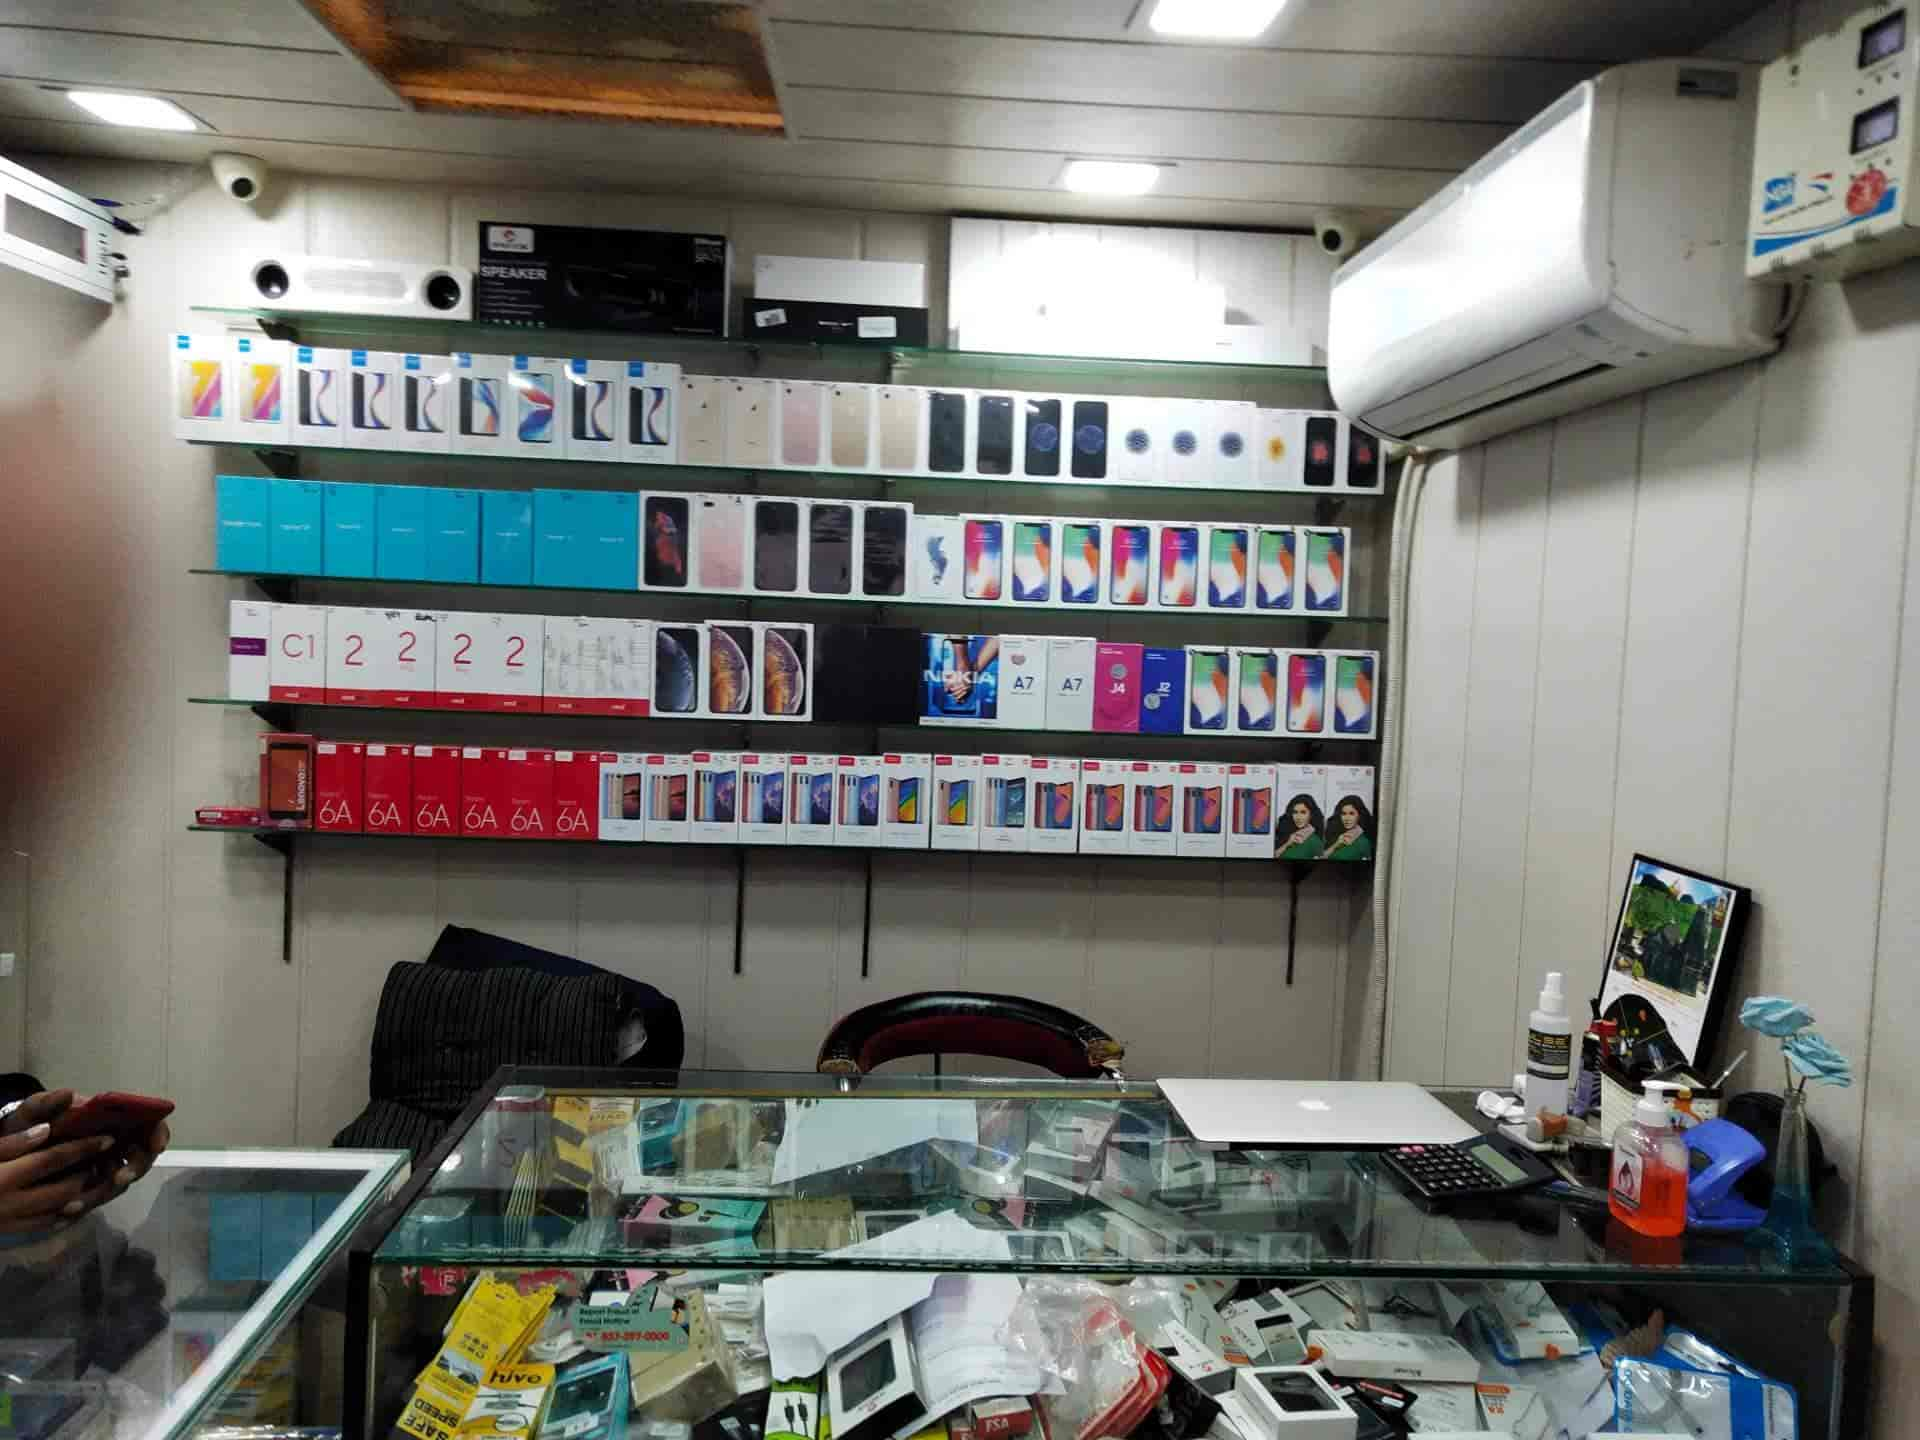 Abhi Mobile House Photos, Jalandhar City, Jalandhar- Pictures